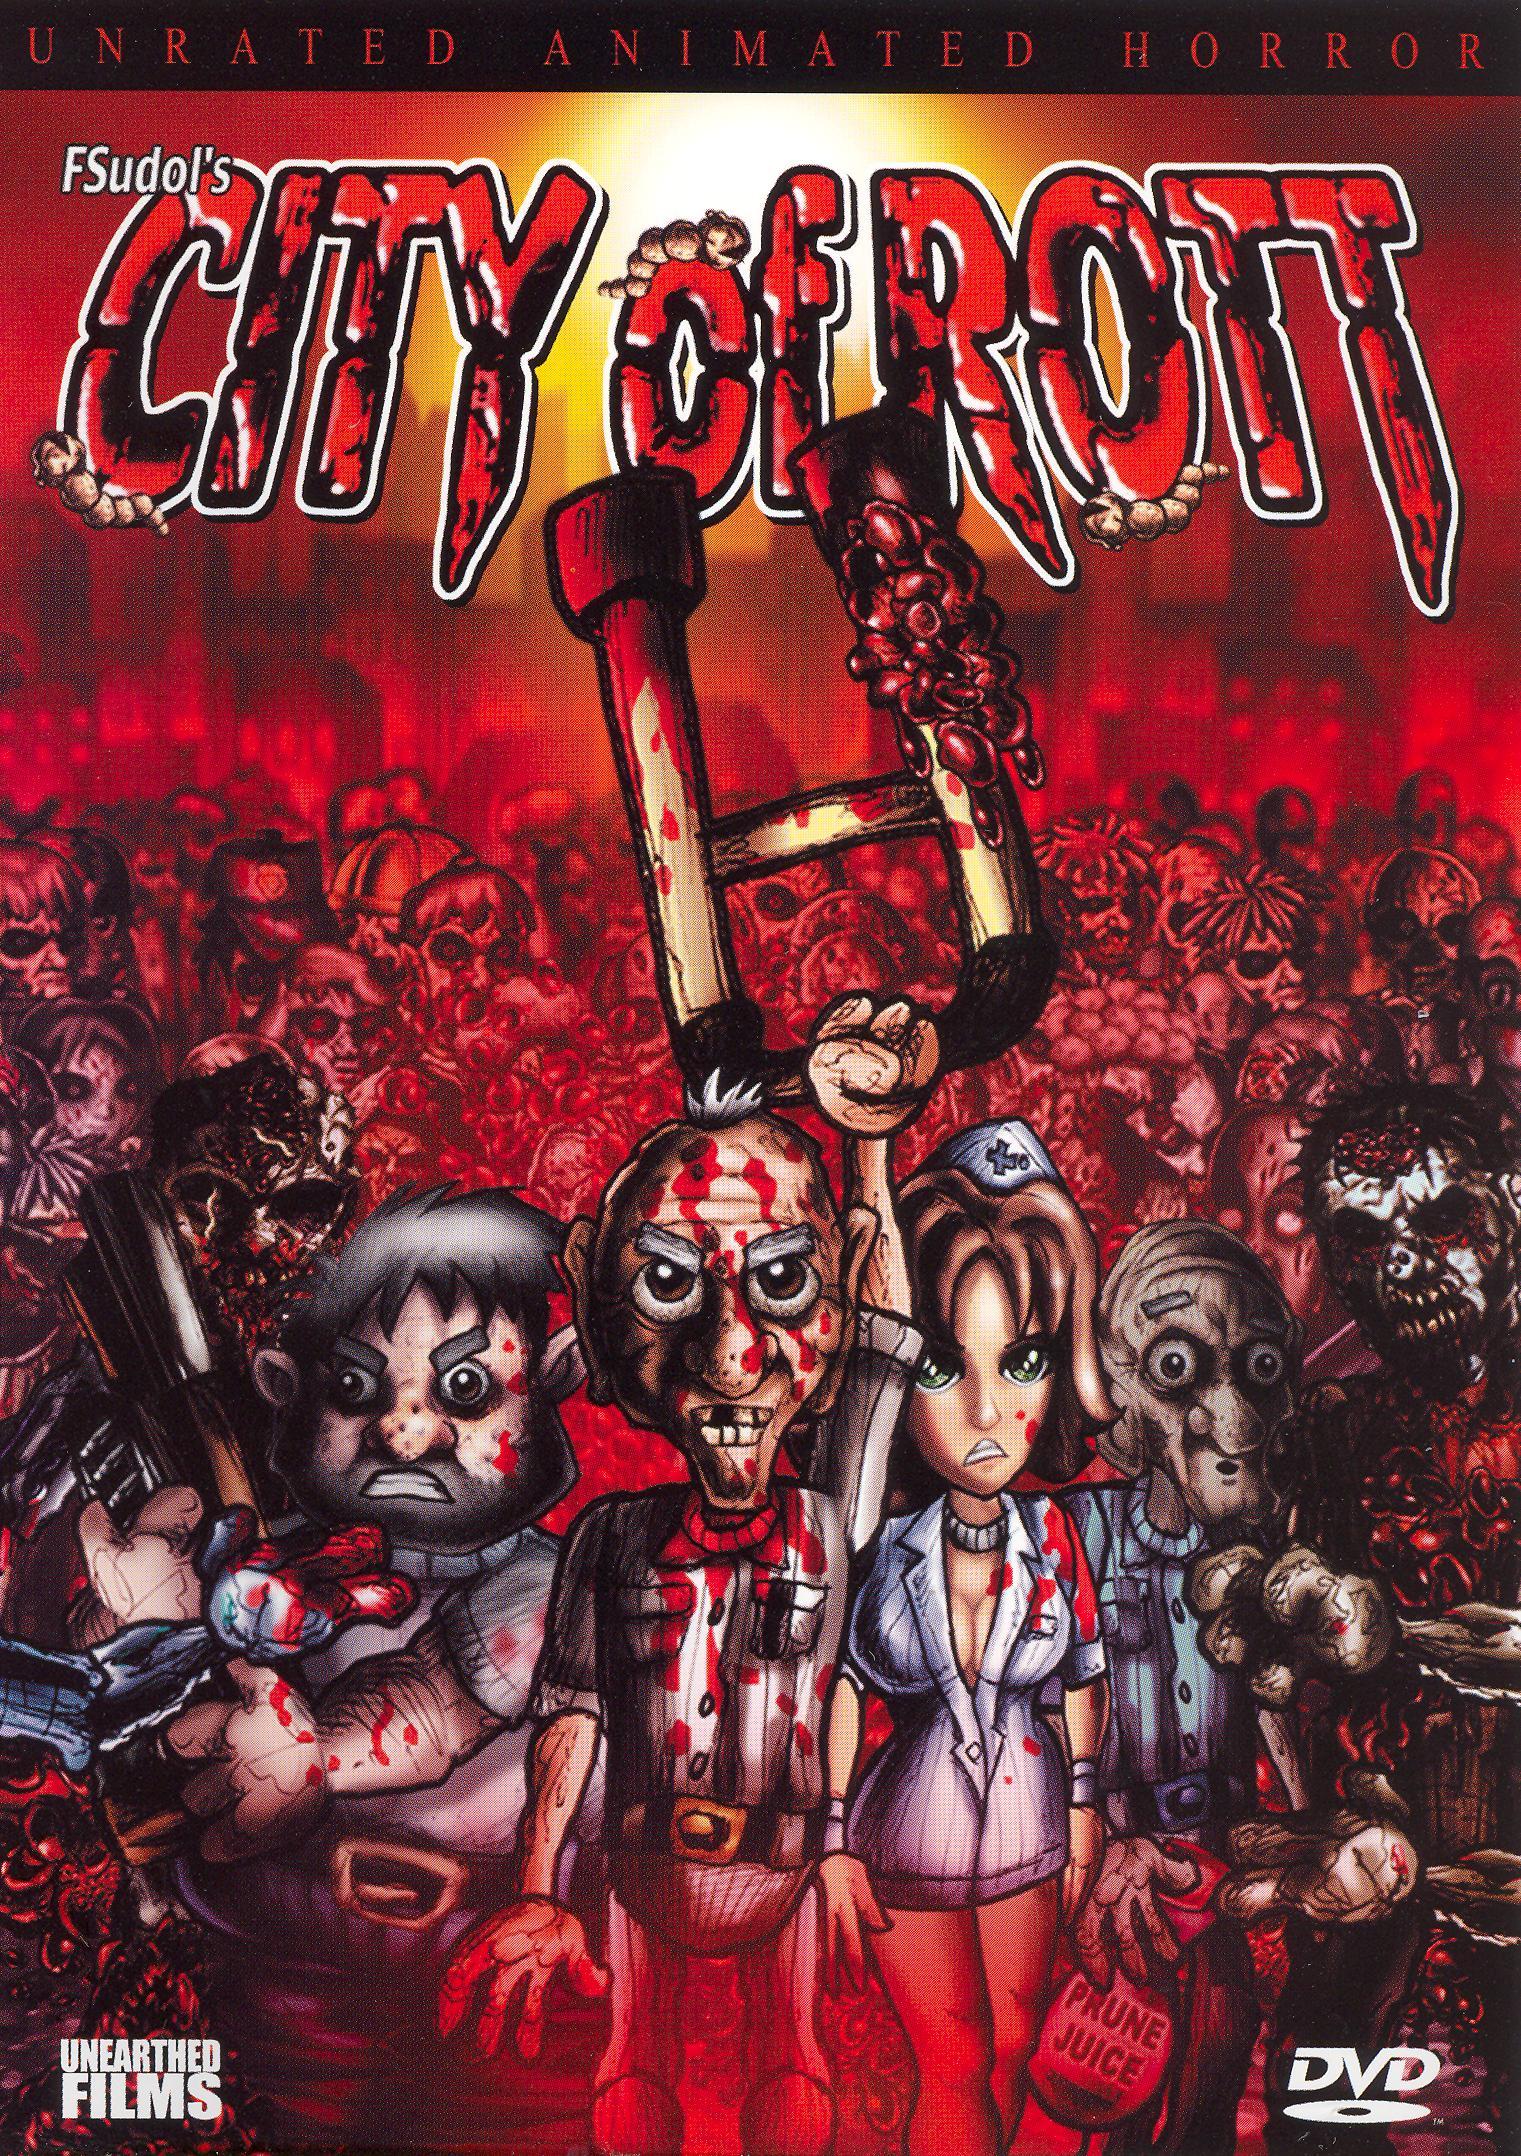 City of Rott